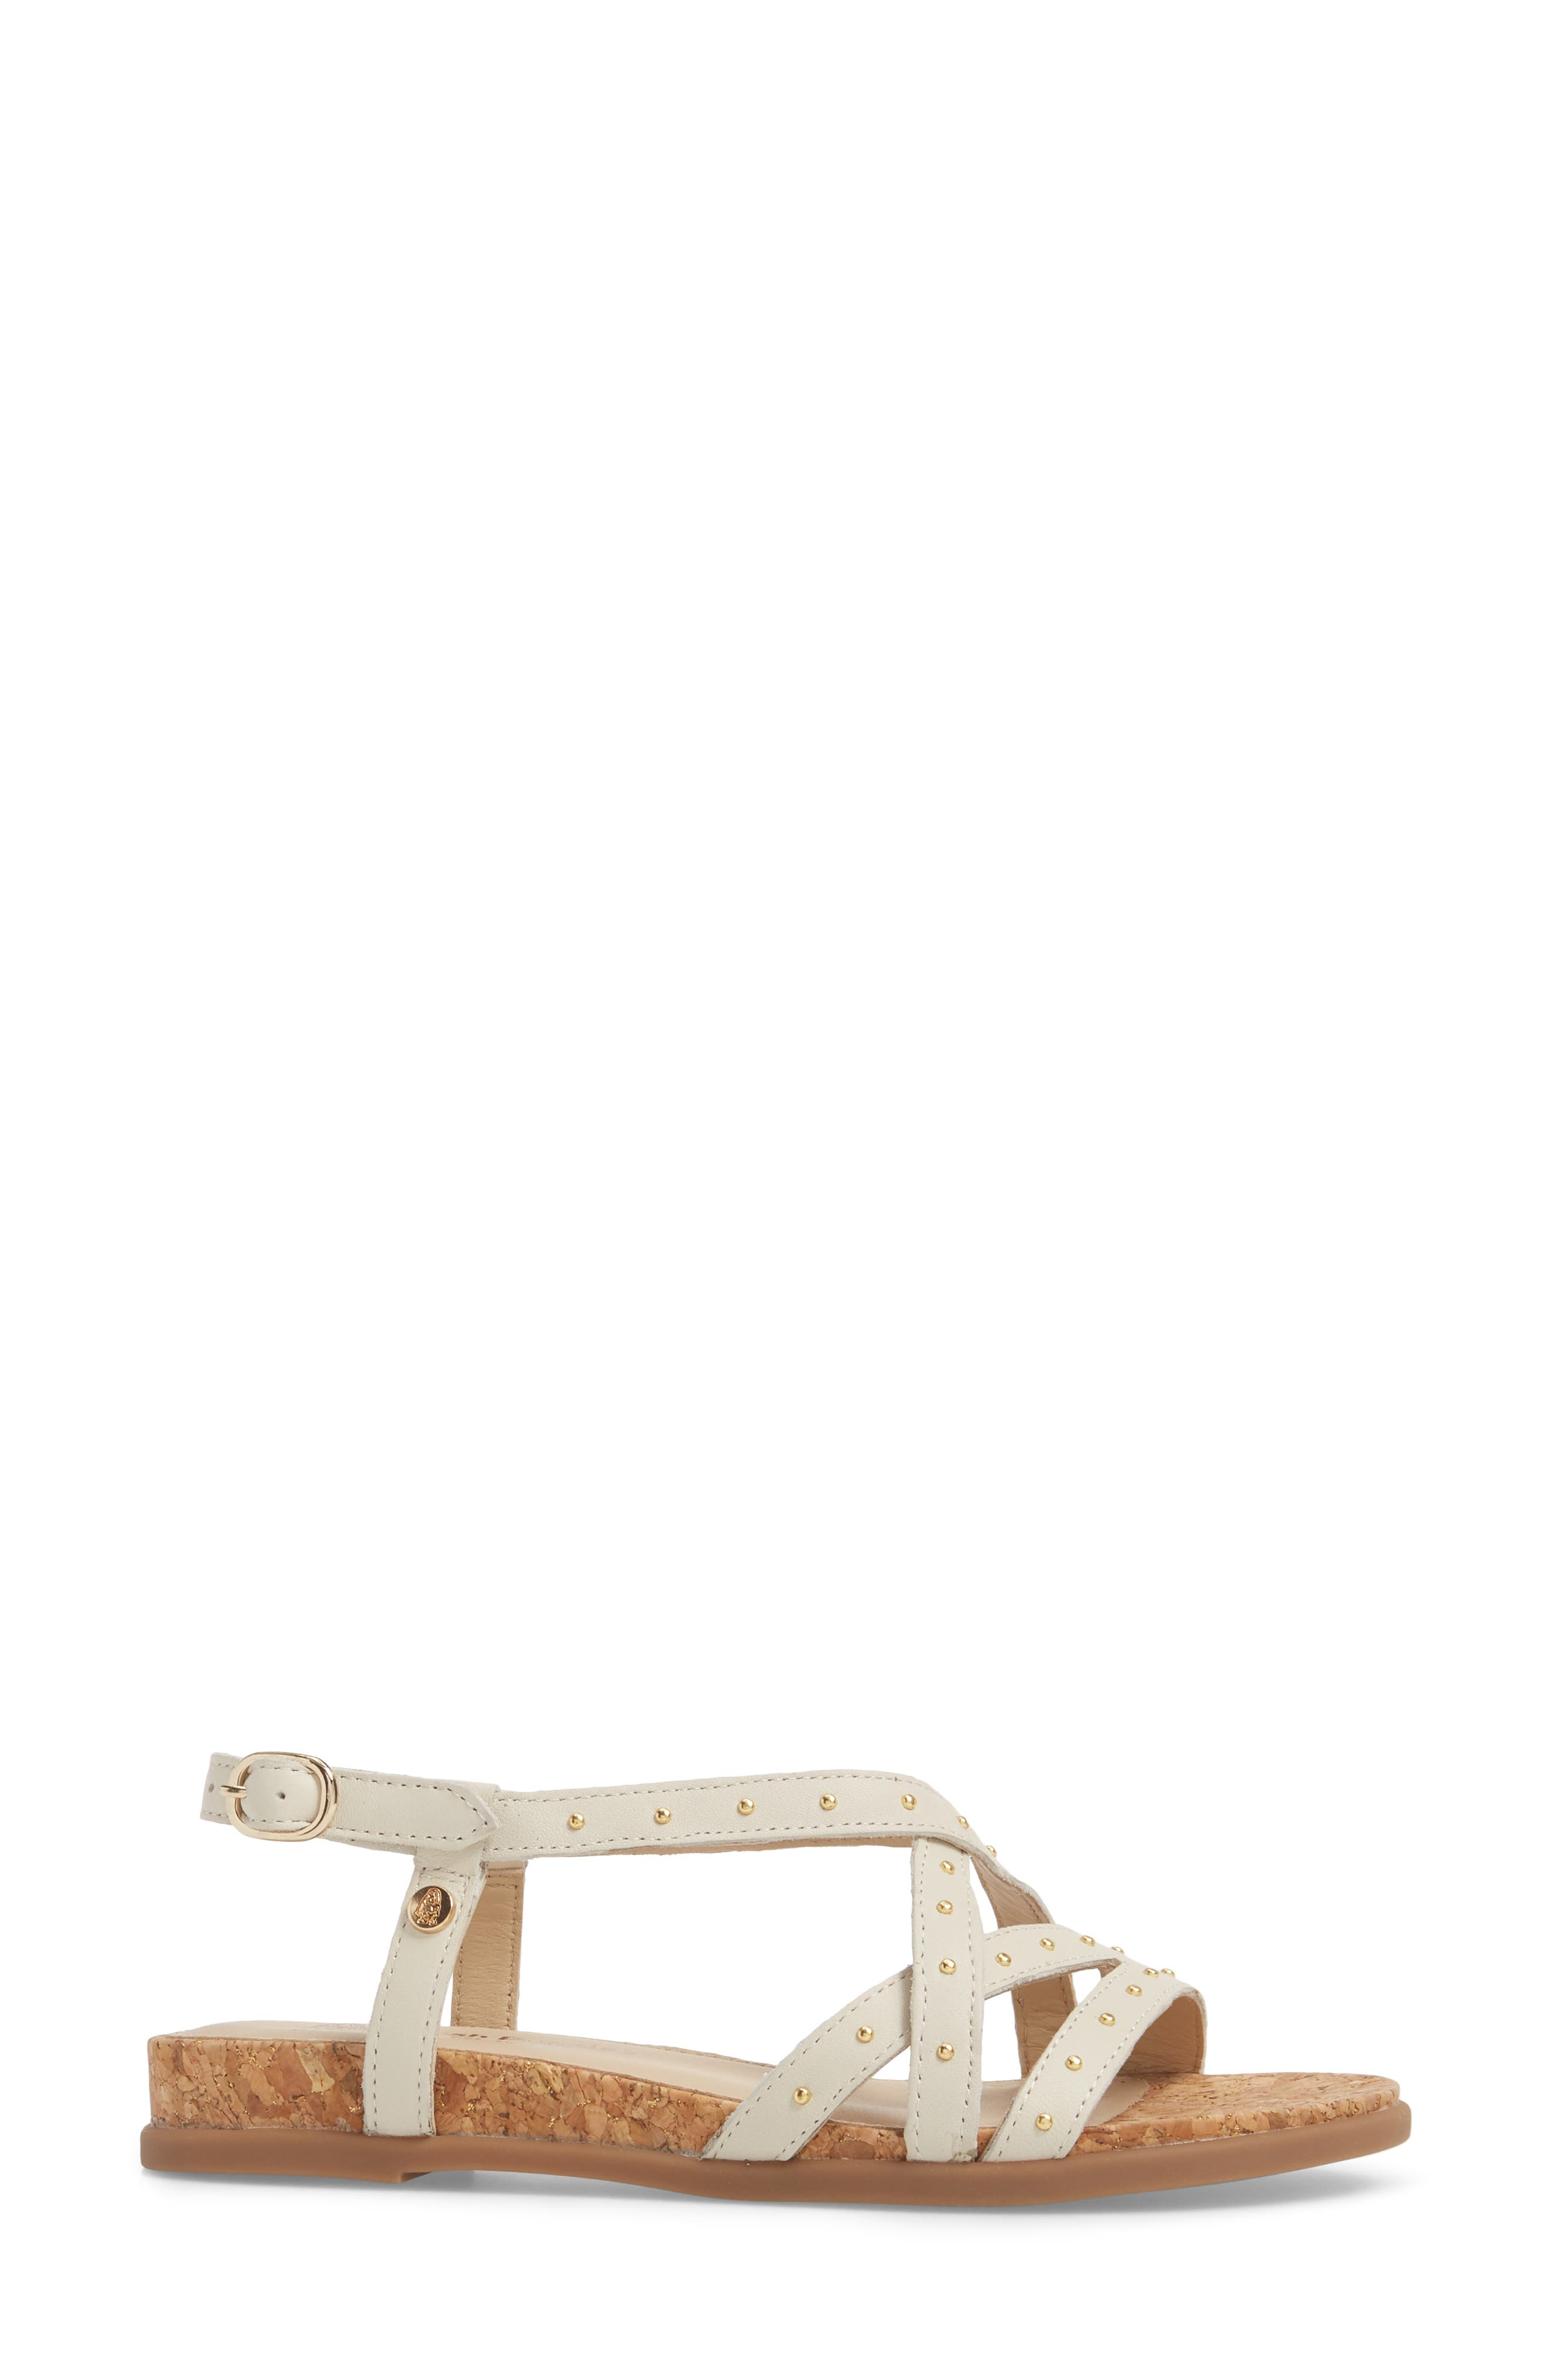 Dalmatian Studded Sandal,                             Alternate thumbnail 3, color,                             Ivory Leather